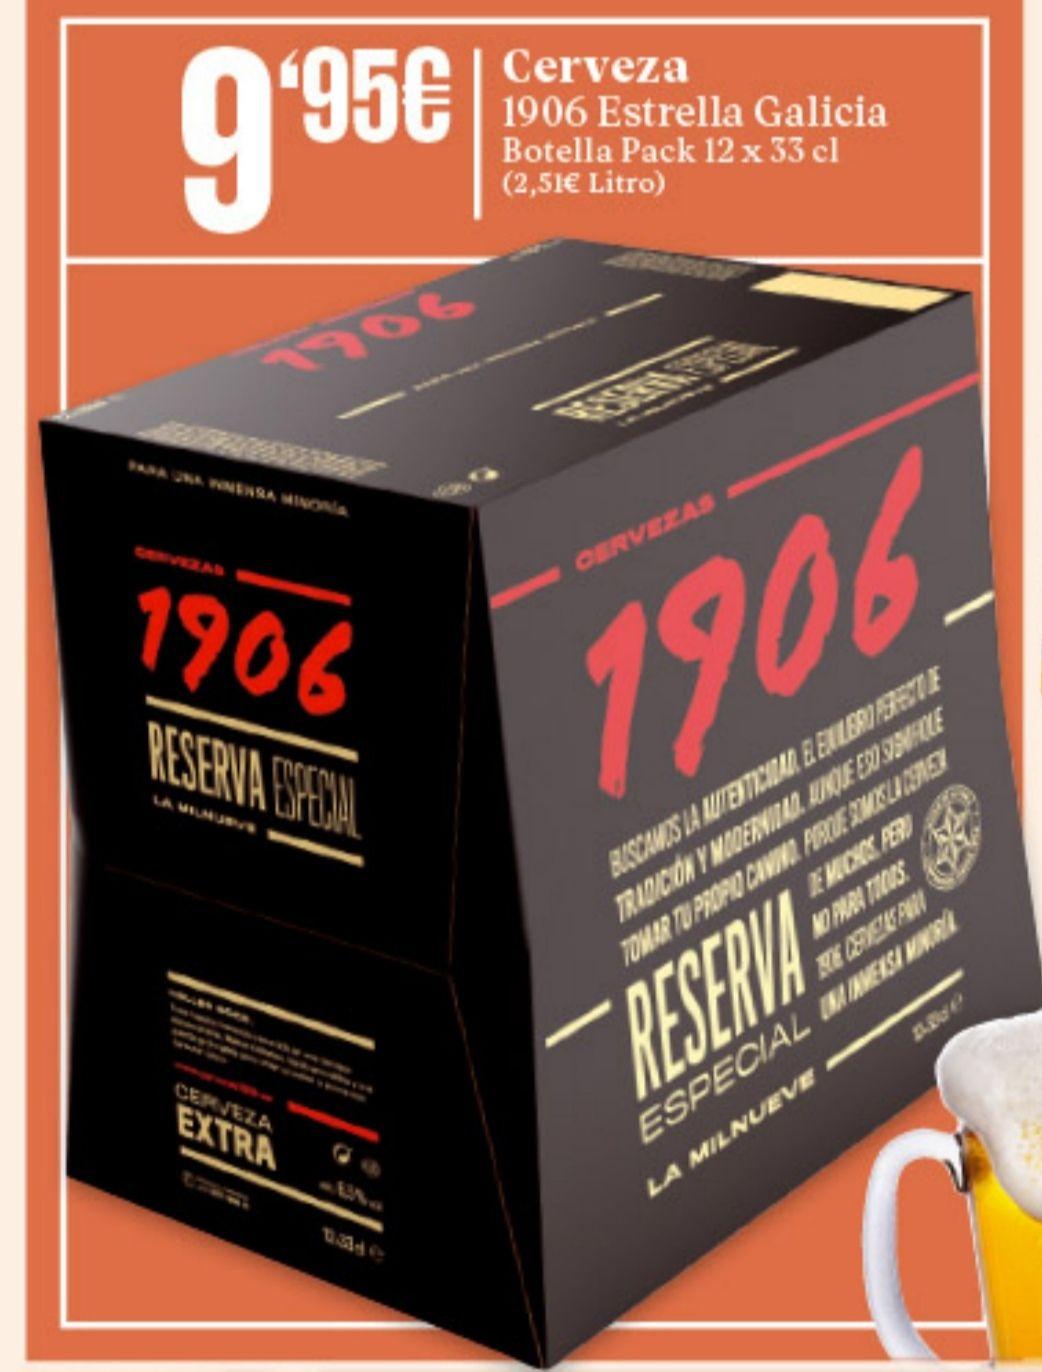 pack 12 botellas de 1906 de 33 cl cristal en supermercados gadis de Galicia